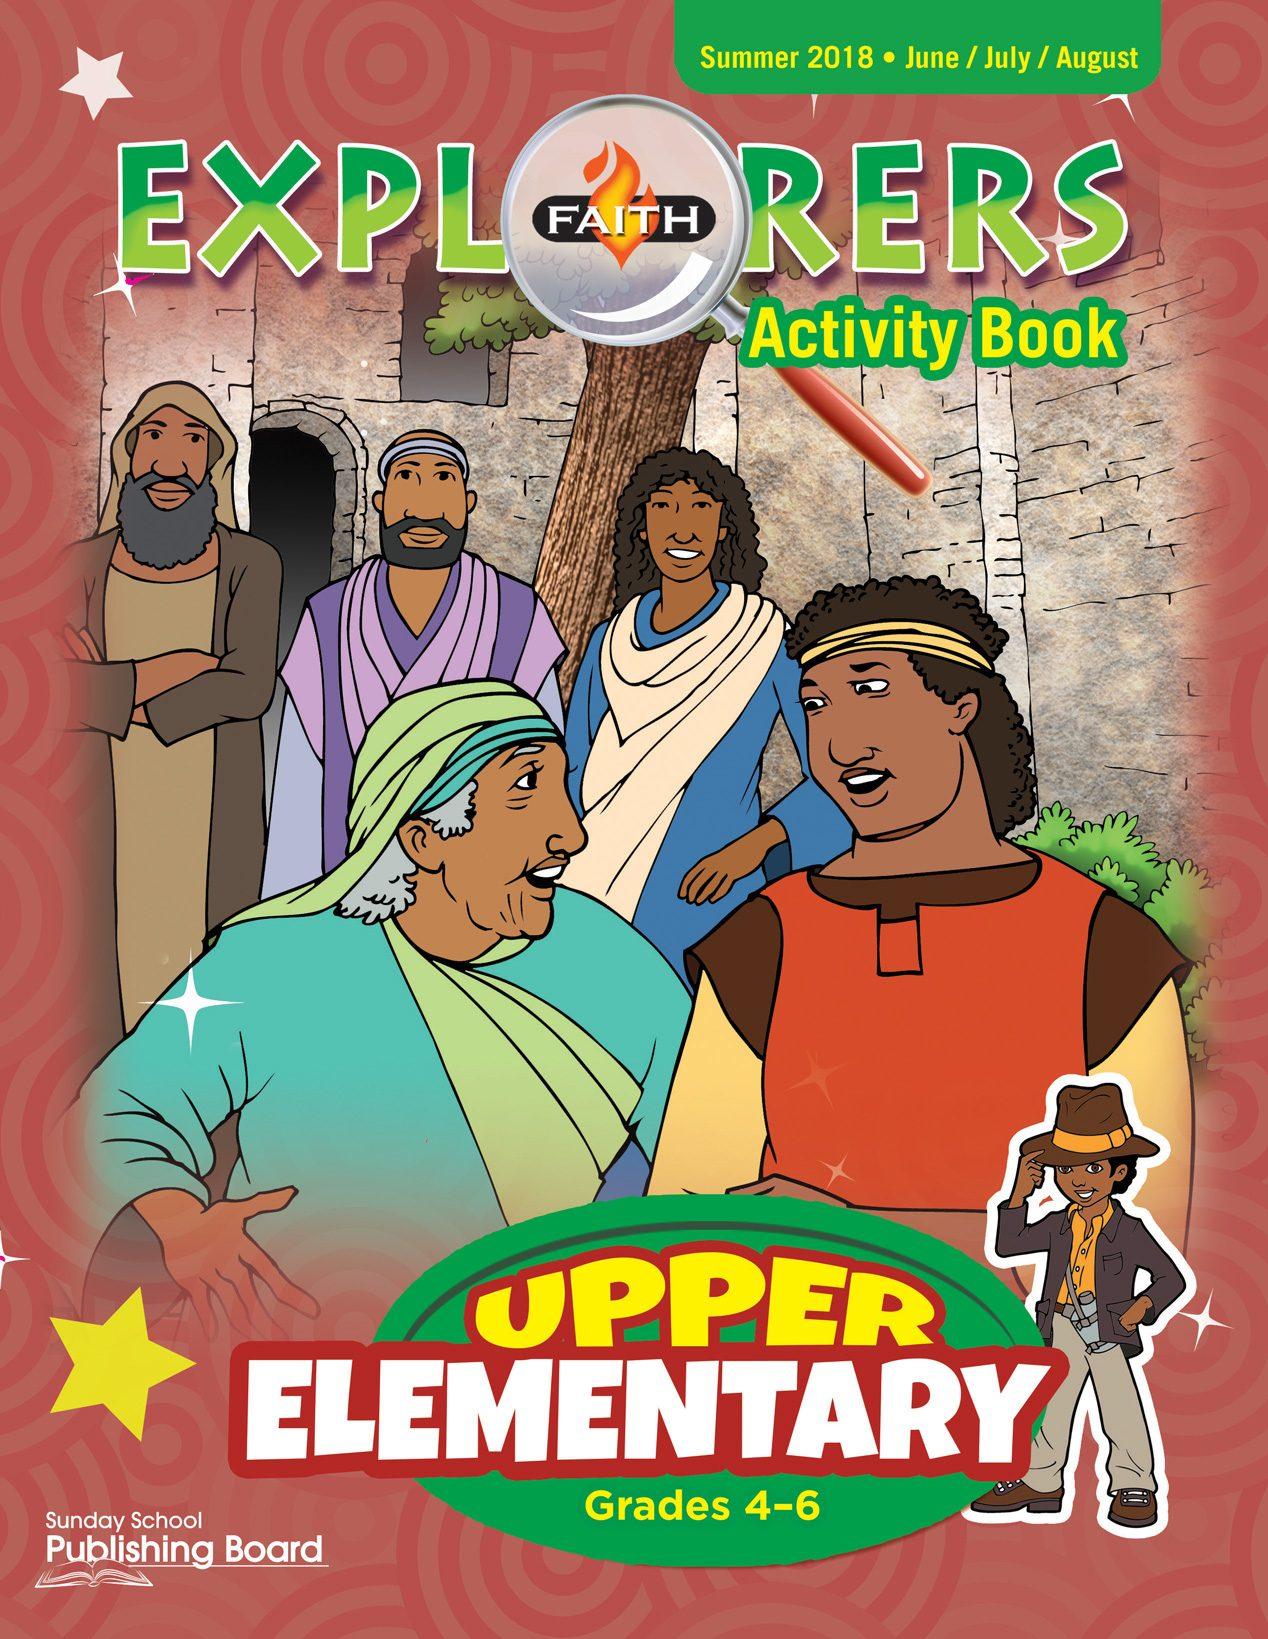 Faith Explorers Activity Book, Upper Elementary for Grades 4-6 (Summer 2018)-Digital Edition